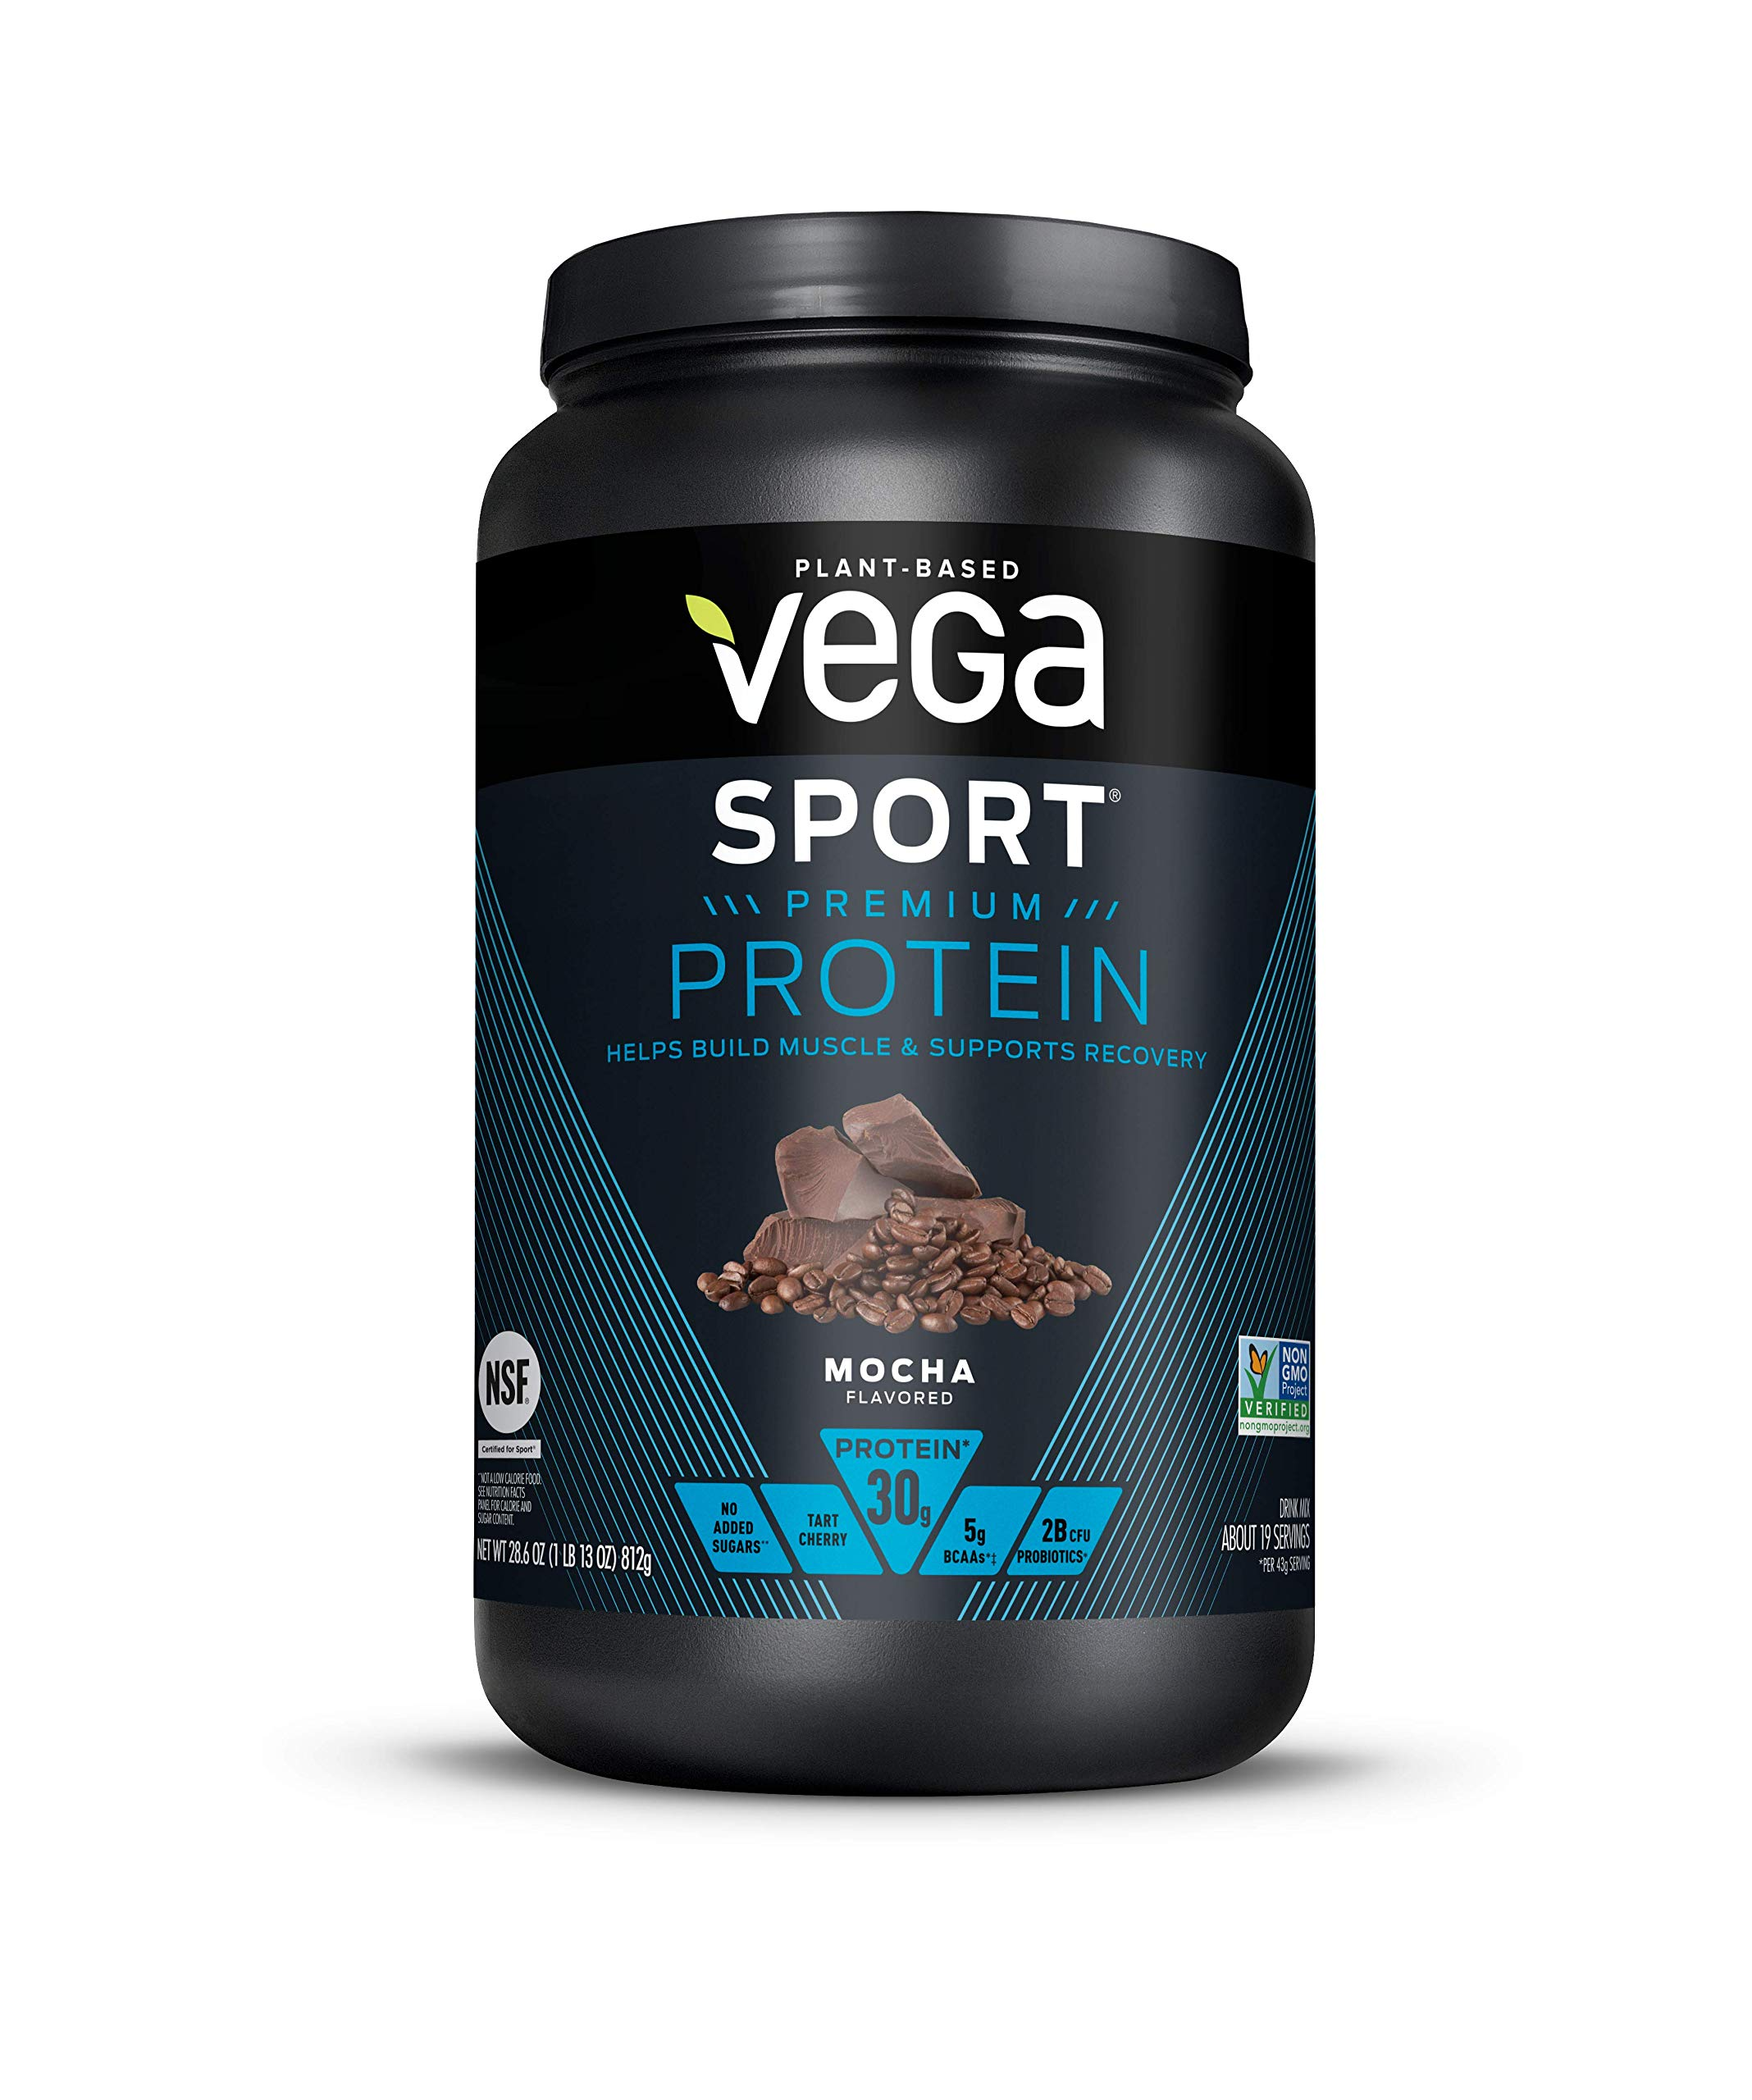 Vega Sport Protein Powder Mocha (19 Servings, 28.6 Ounce) - Plant-Based Vegan Protein Powder, BCAAs, Amino Acid, tart cherry, Non Dairy, Keto-Friendly, Gluten Free,  Non GMO (Packaging May Vary)